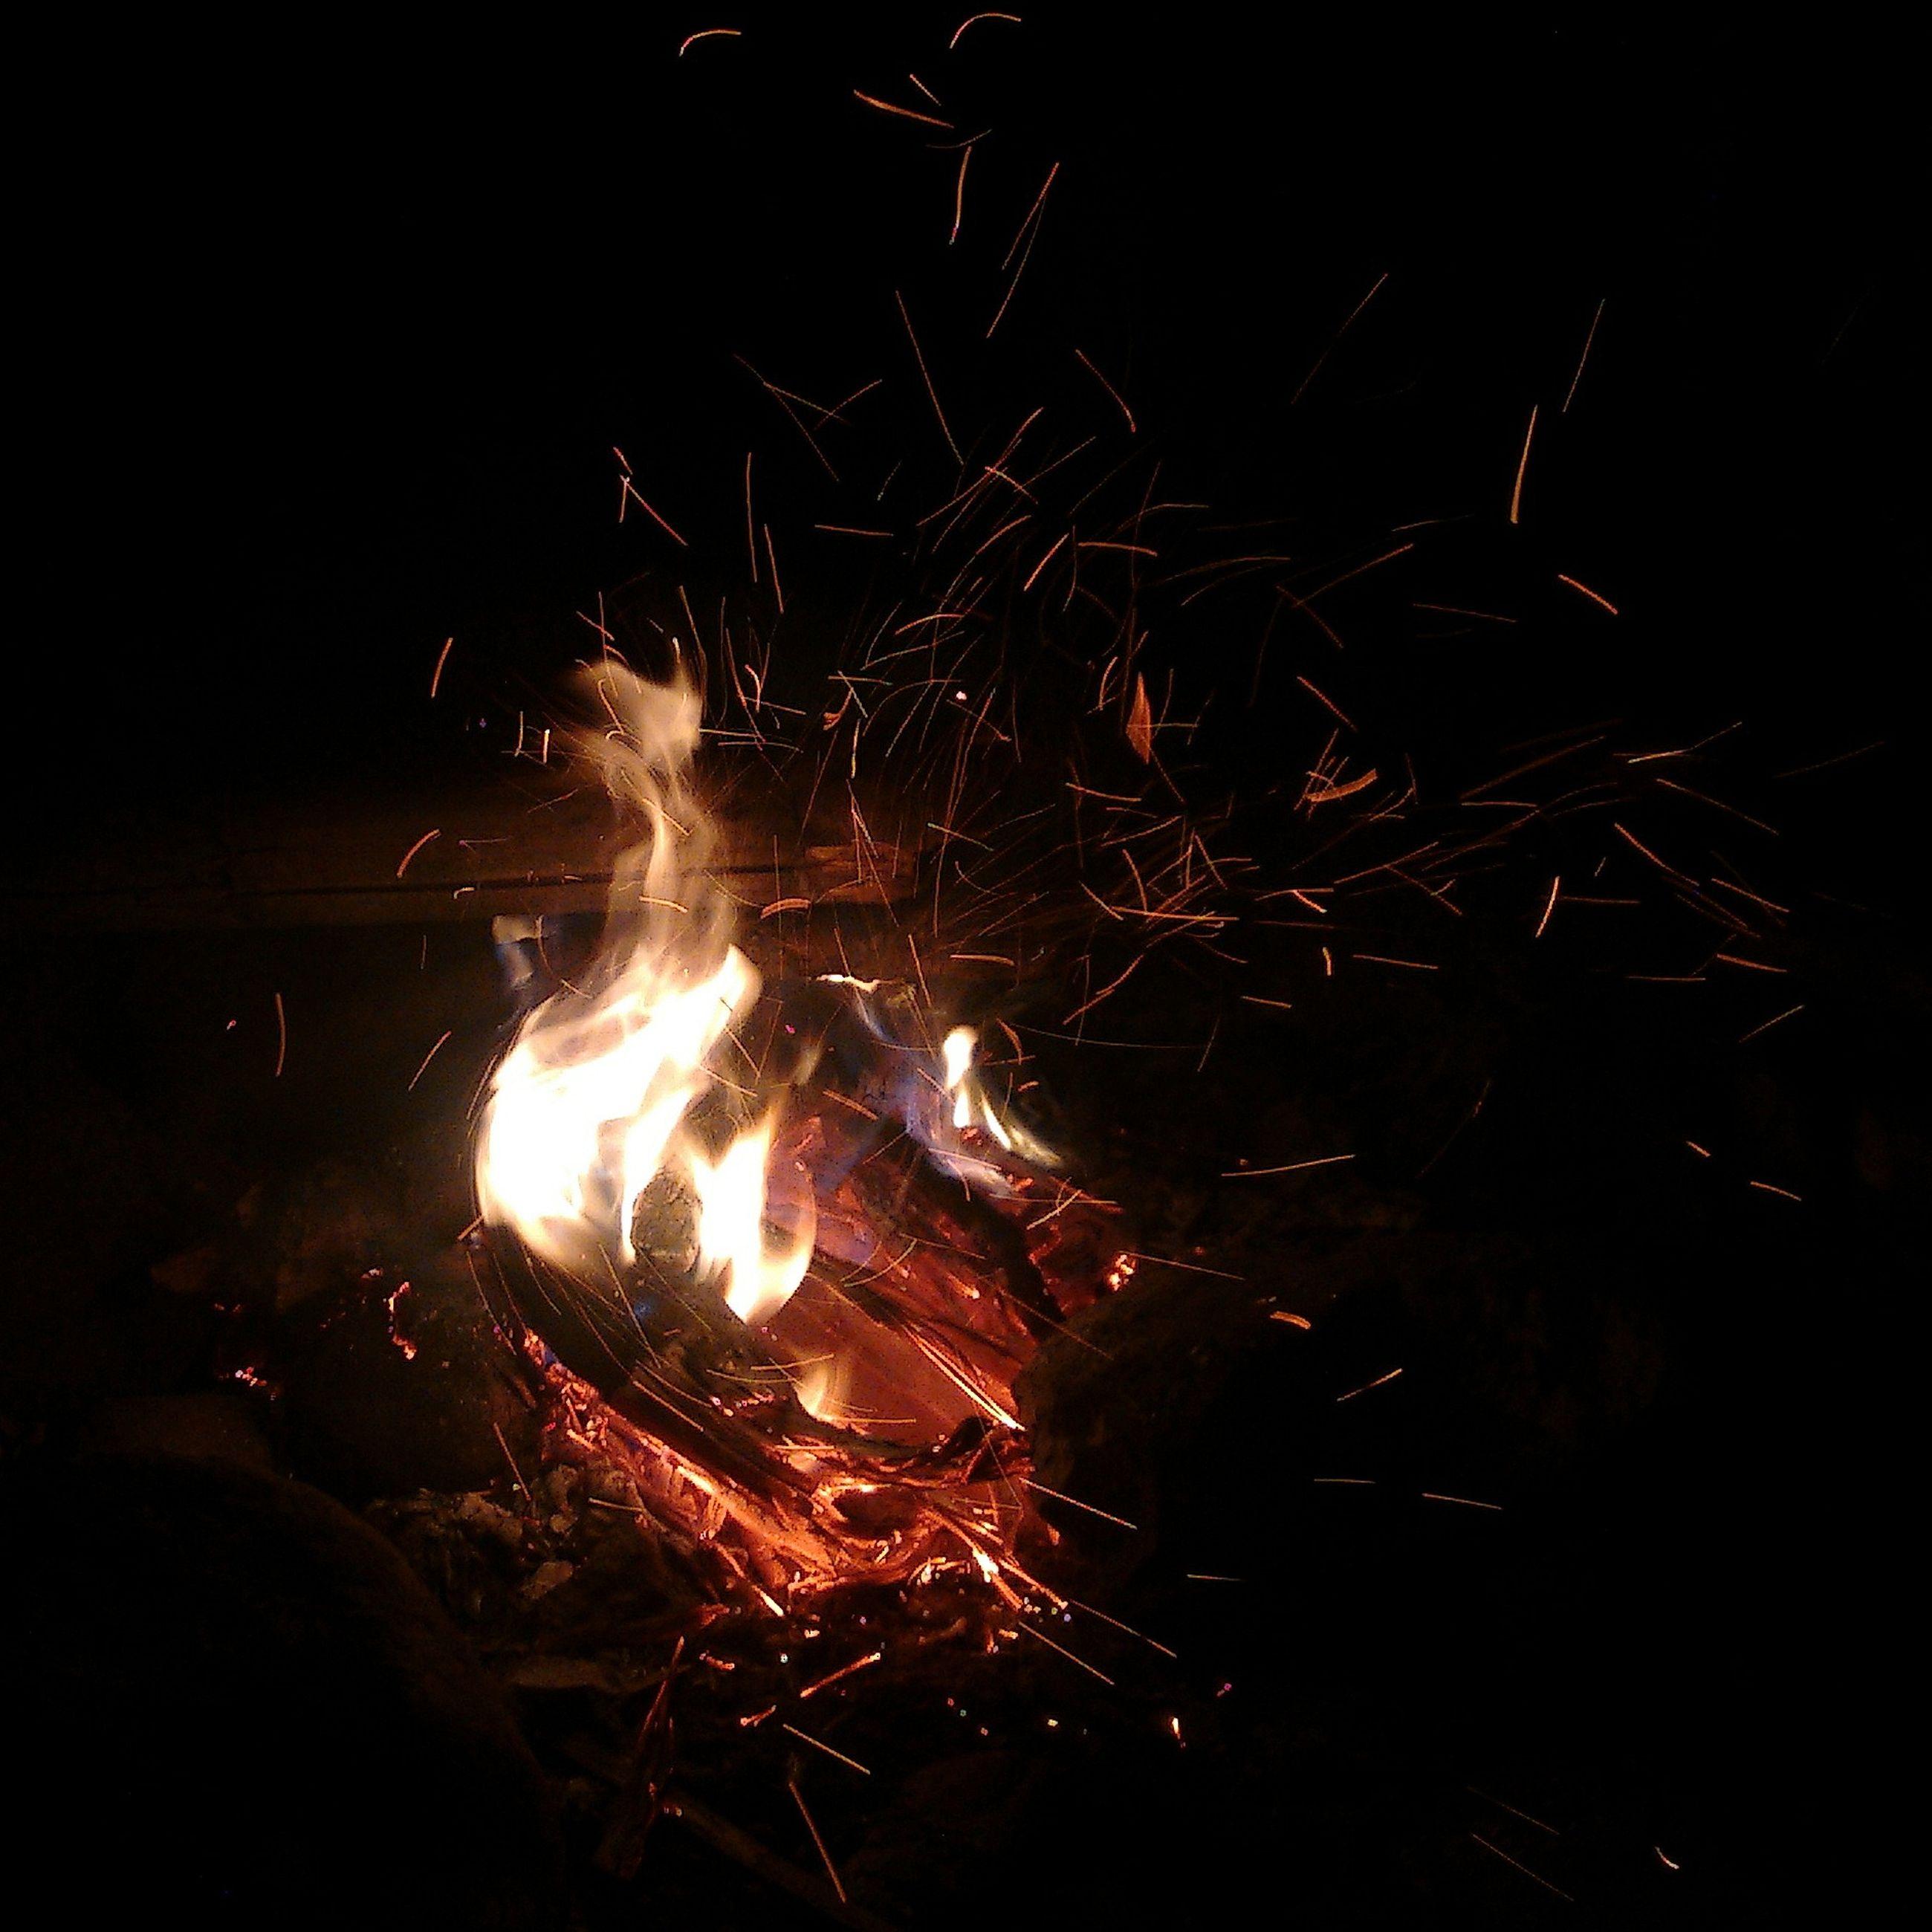 night, illuminated, fire - natural phenomenon, glowing, burning, celebration, long exposure, dark, flame, firework display, motion, light - natural phenomenon, firework - man made object, exploding, heat - temperature, sparks, outdoors, no people, light, bonfire